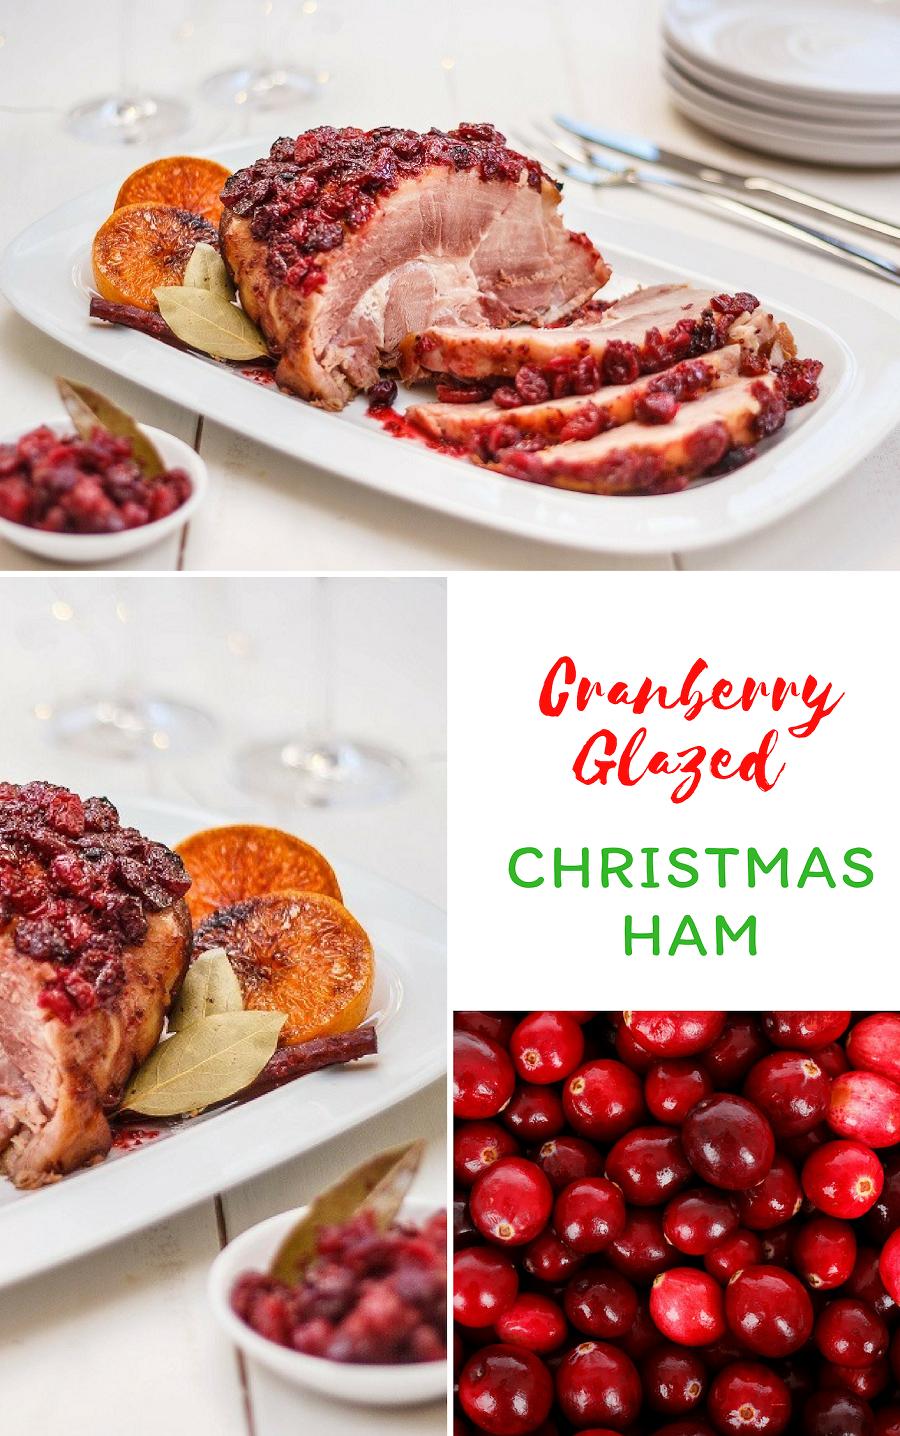 Cranberry Glazed Christmas Ham